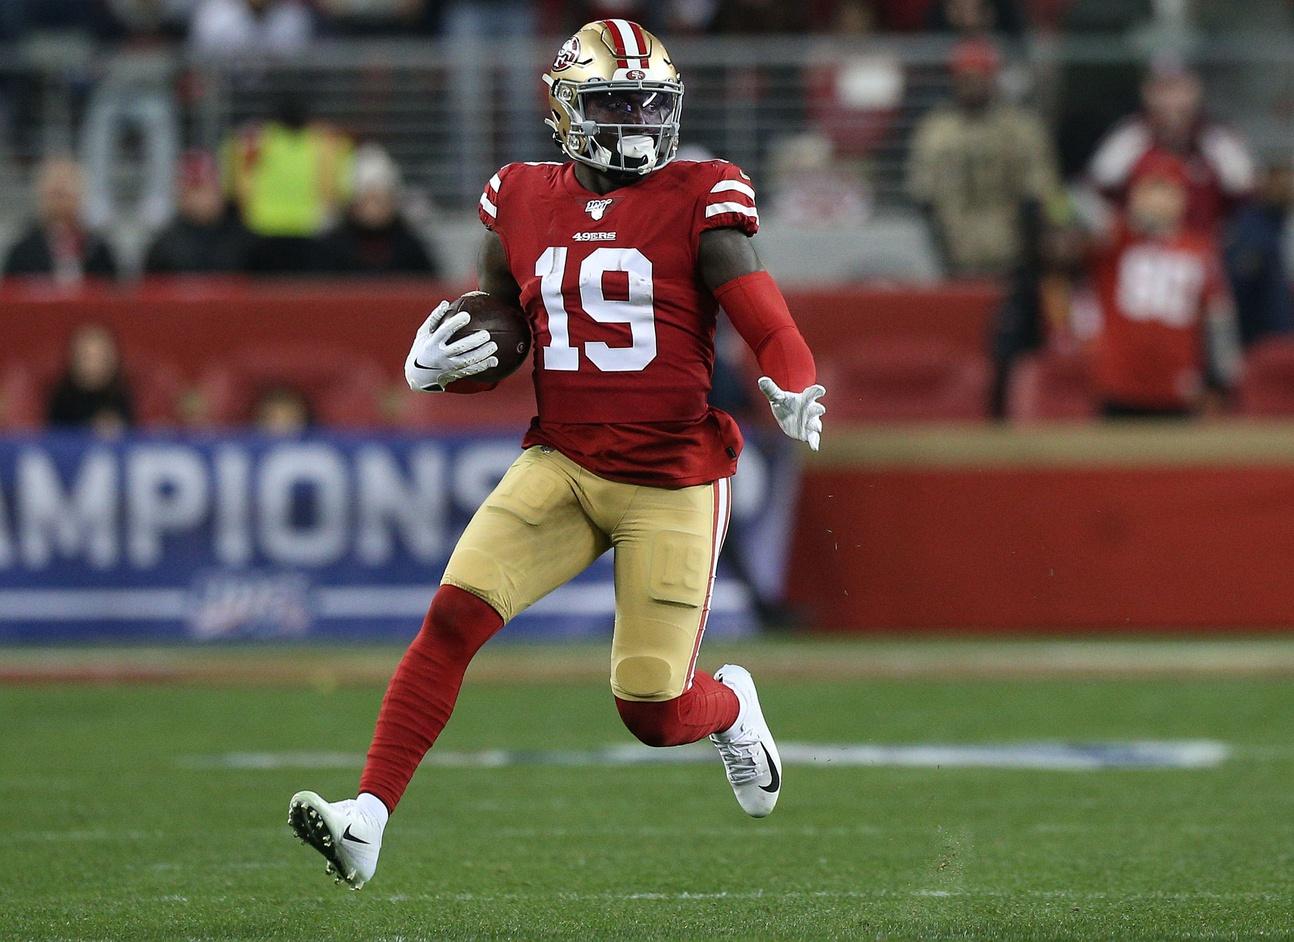 NFL injury report: 49ers rule Deebo Samuel out for Week 1